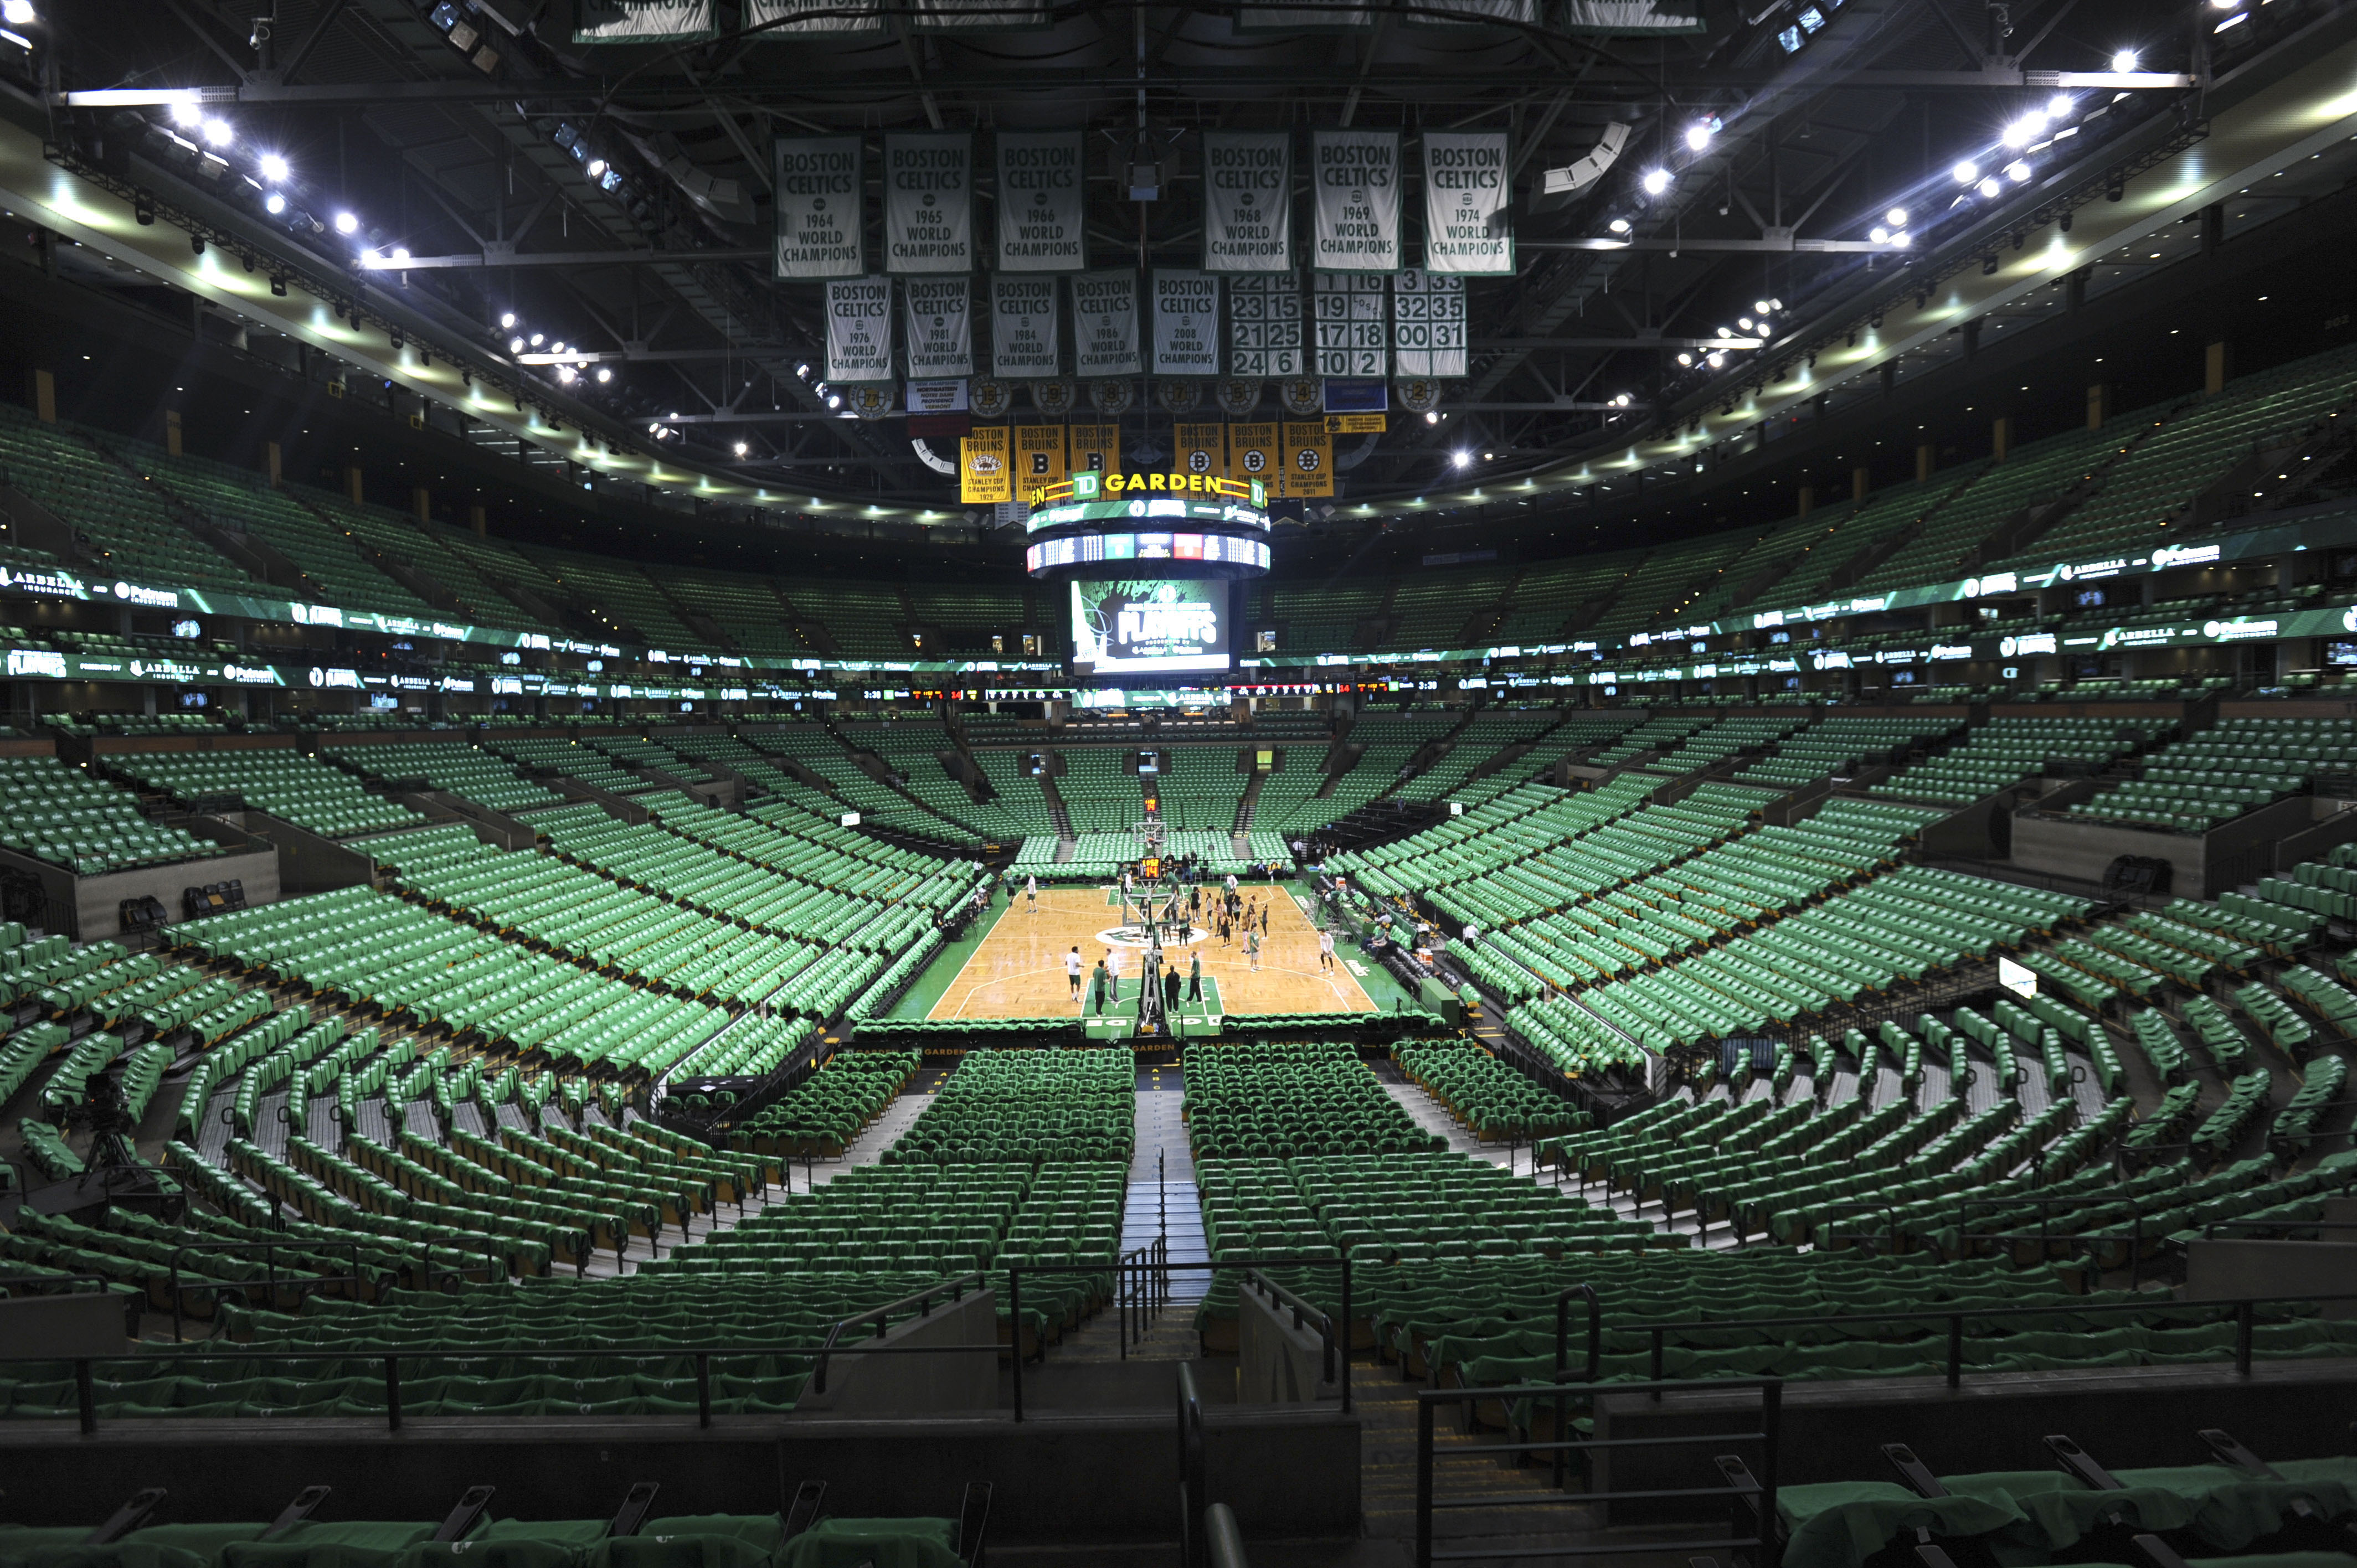 9267445-nba-playoffs-atlanta-hawks-at-boston-celtics